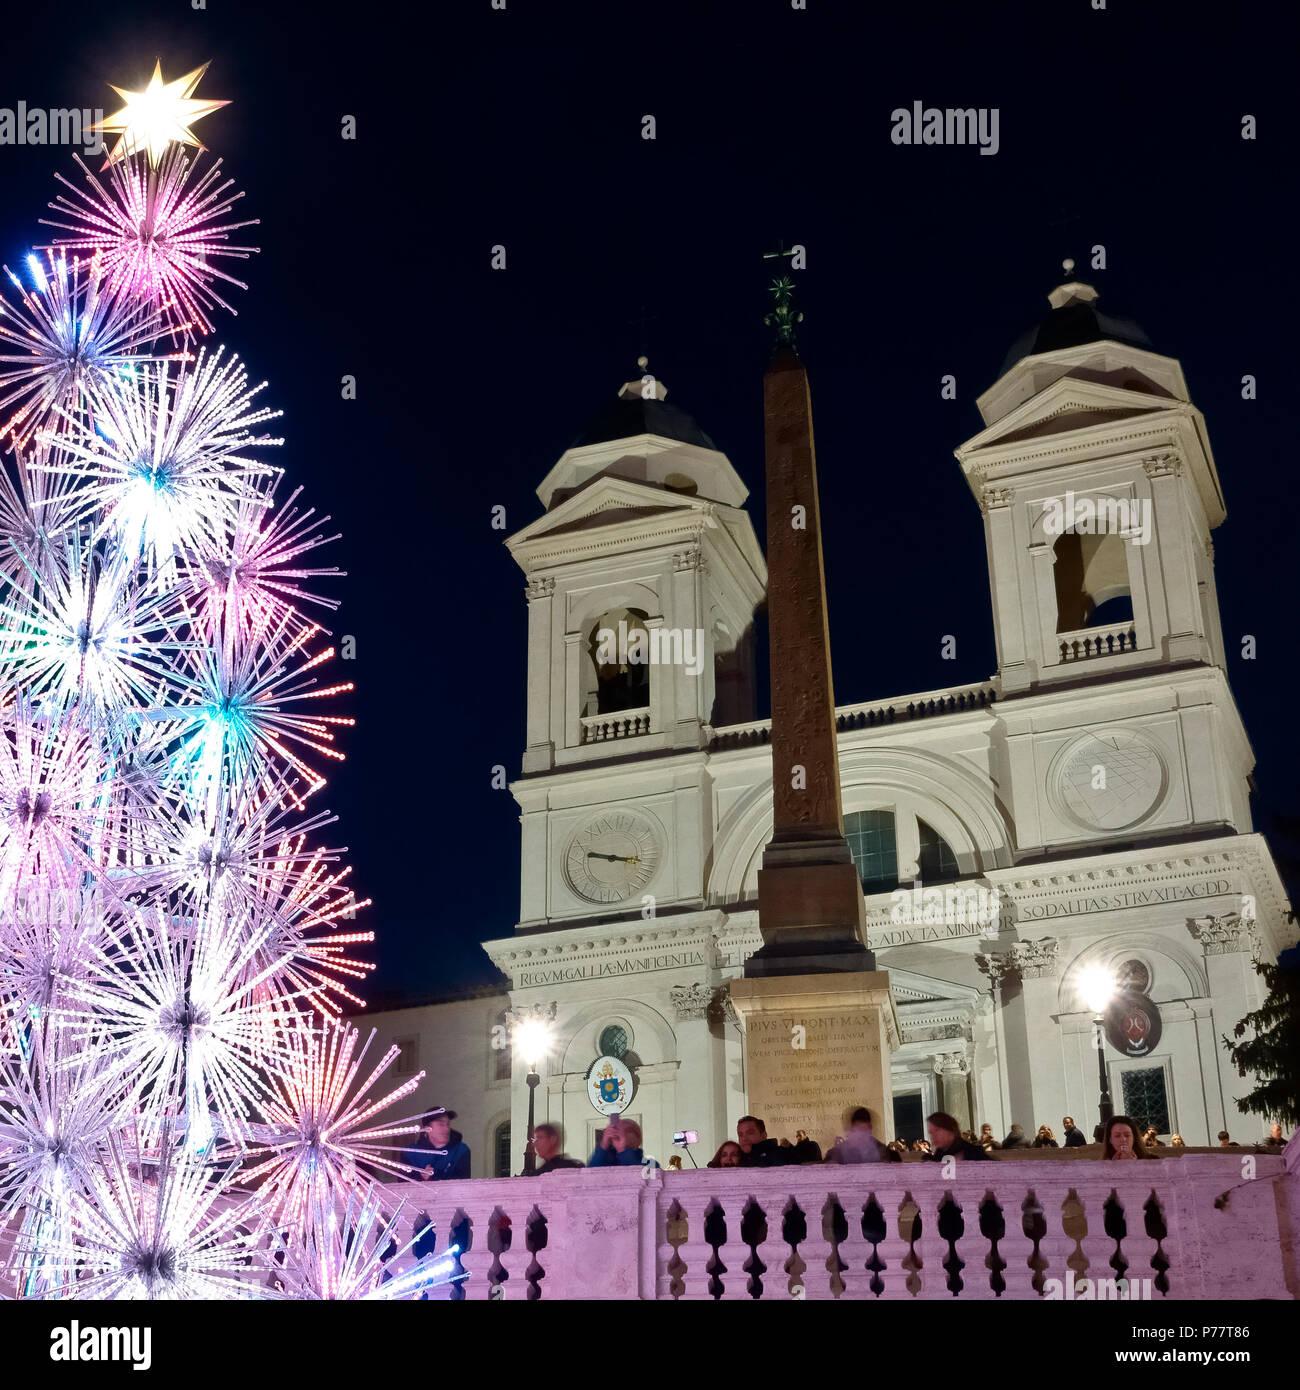 Christmas led tree, at the Spanish Steps Square, Trinità dei Monti, Piazza di Spagna. Christmastime, winter season. Rome, Italy, Europe. Close up. - Stock Image